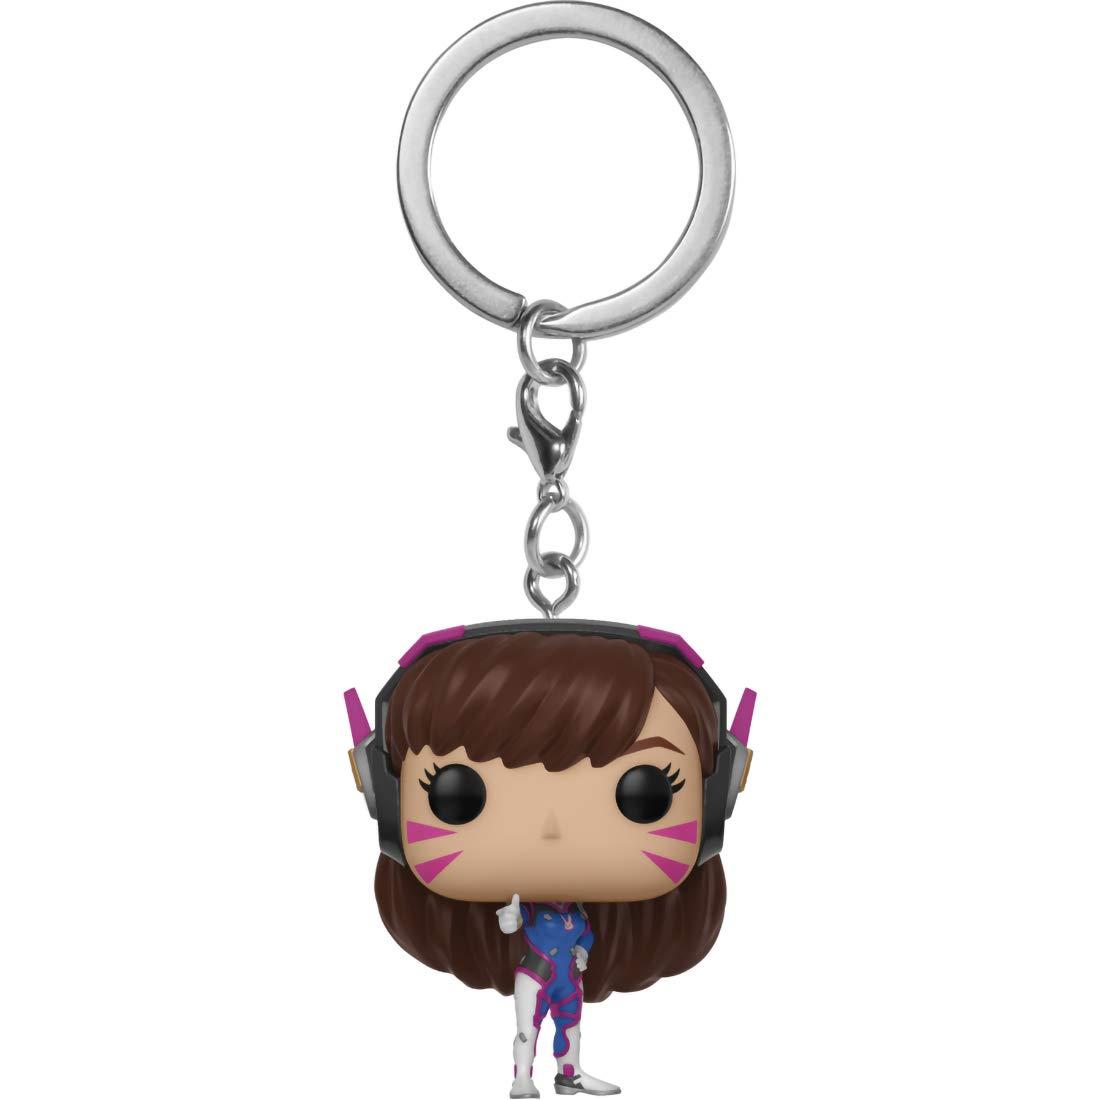 Amazon.com: Funko D.Va: Overwatch x Pocket POP! Mini-Figural ...